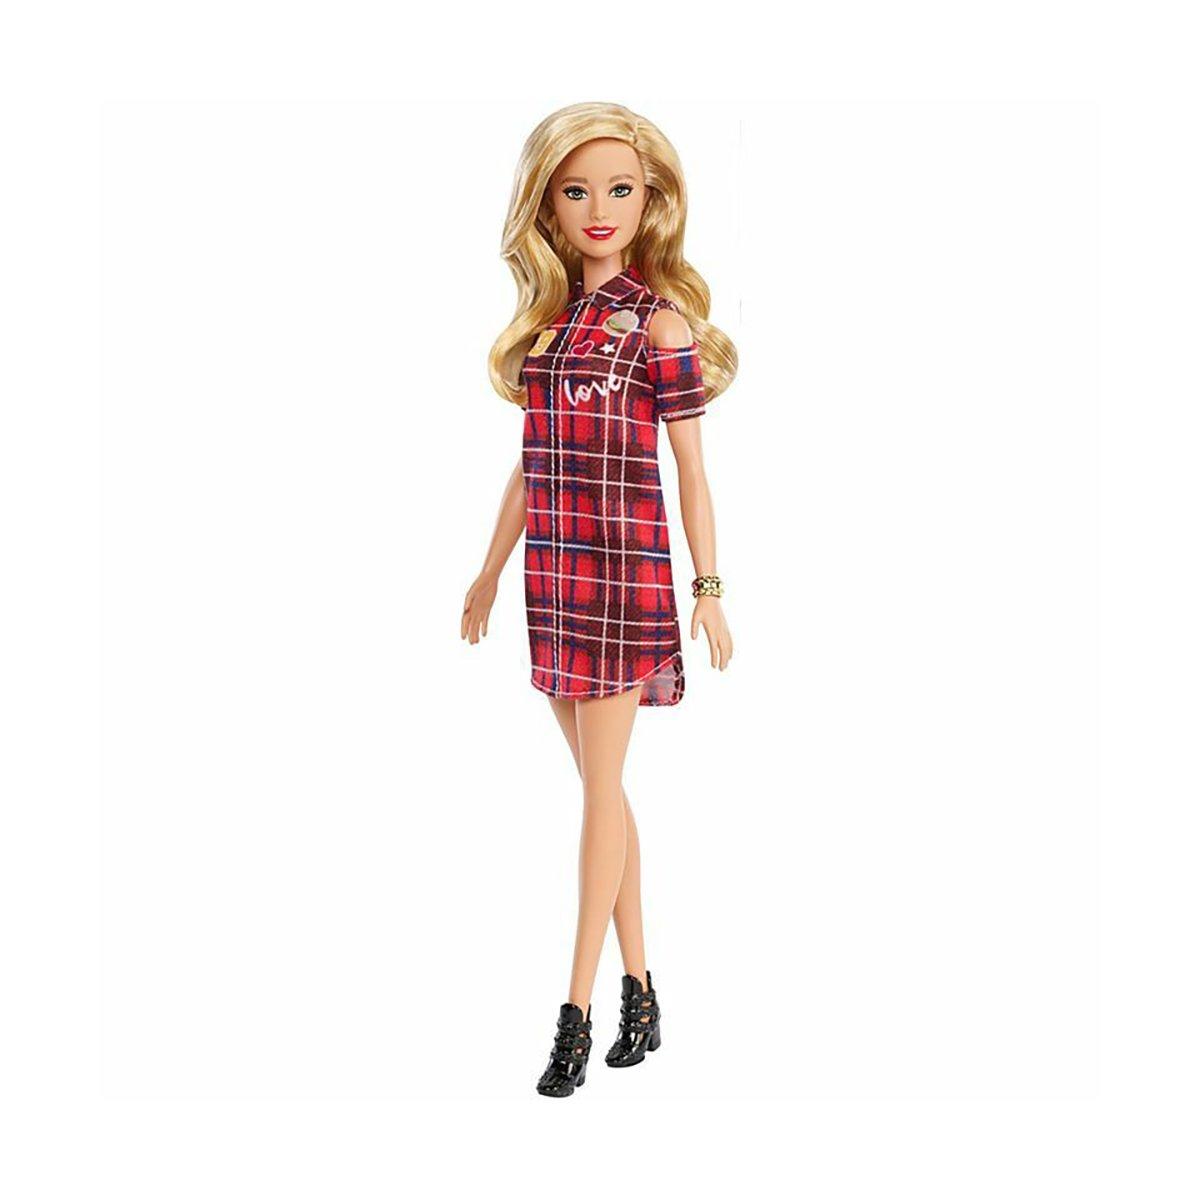 Papusa Barbie Fashionistas - Style, GBK09 imagine